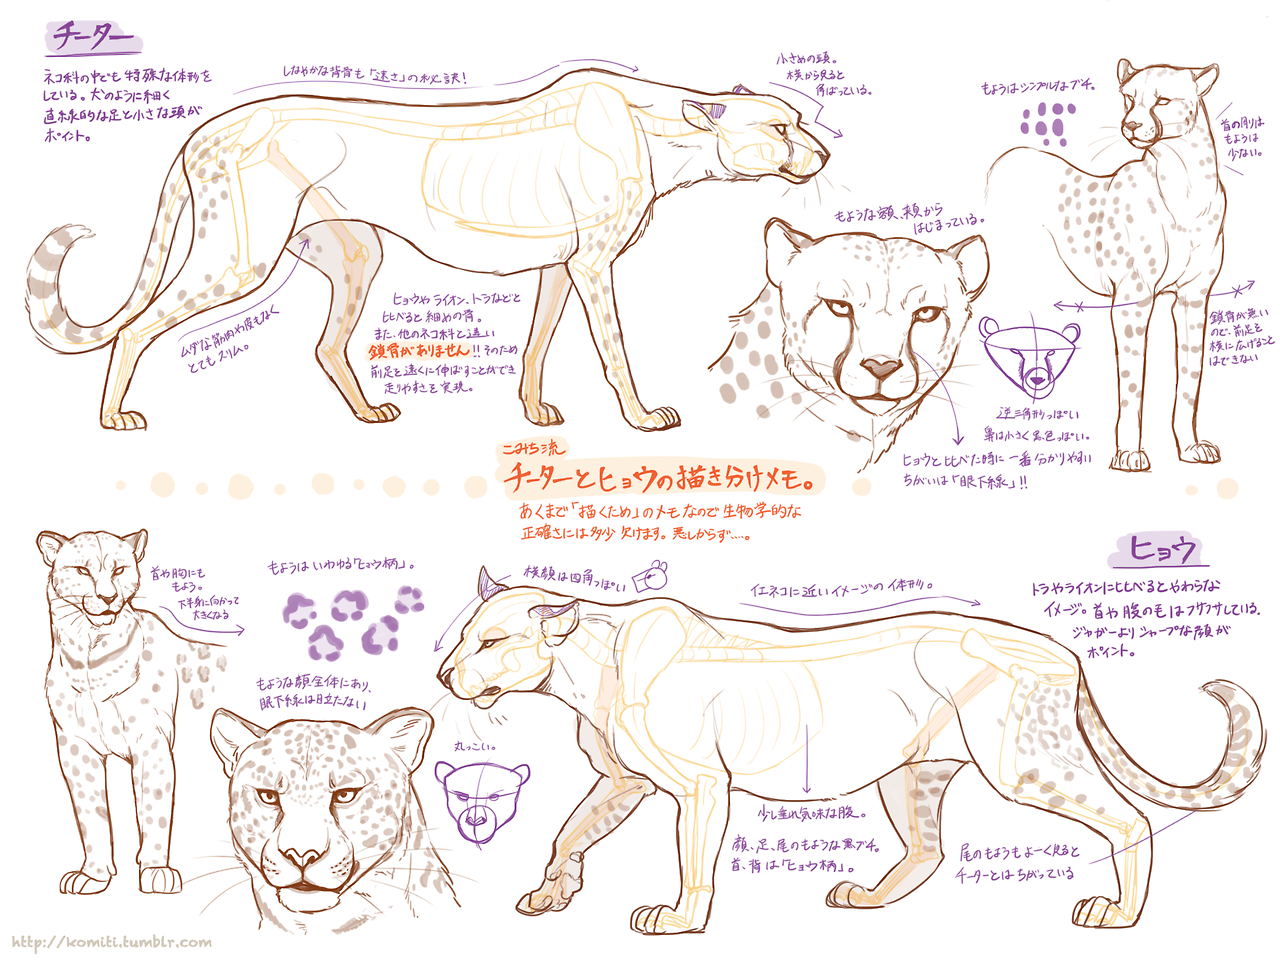 Cheetah_body_studynotes by komiti // http://komiti.tumblr.com ...